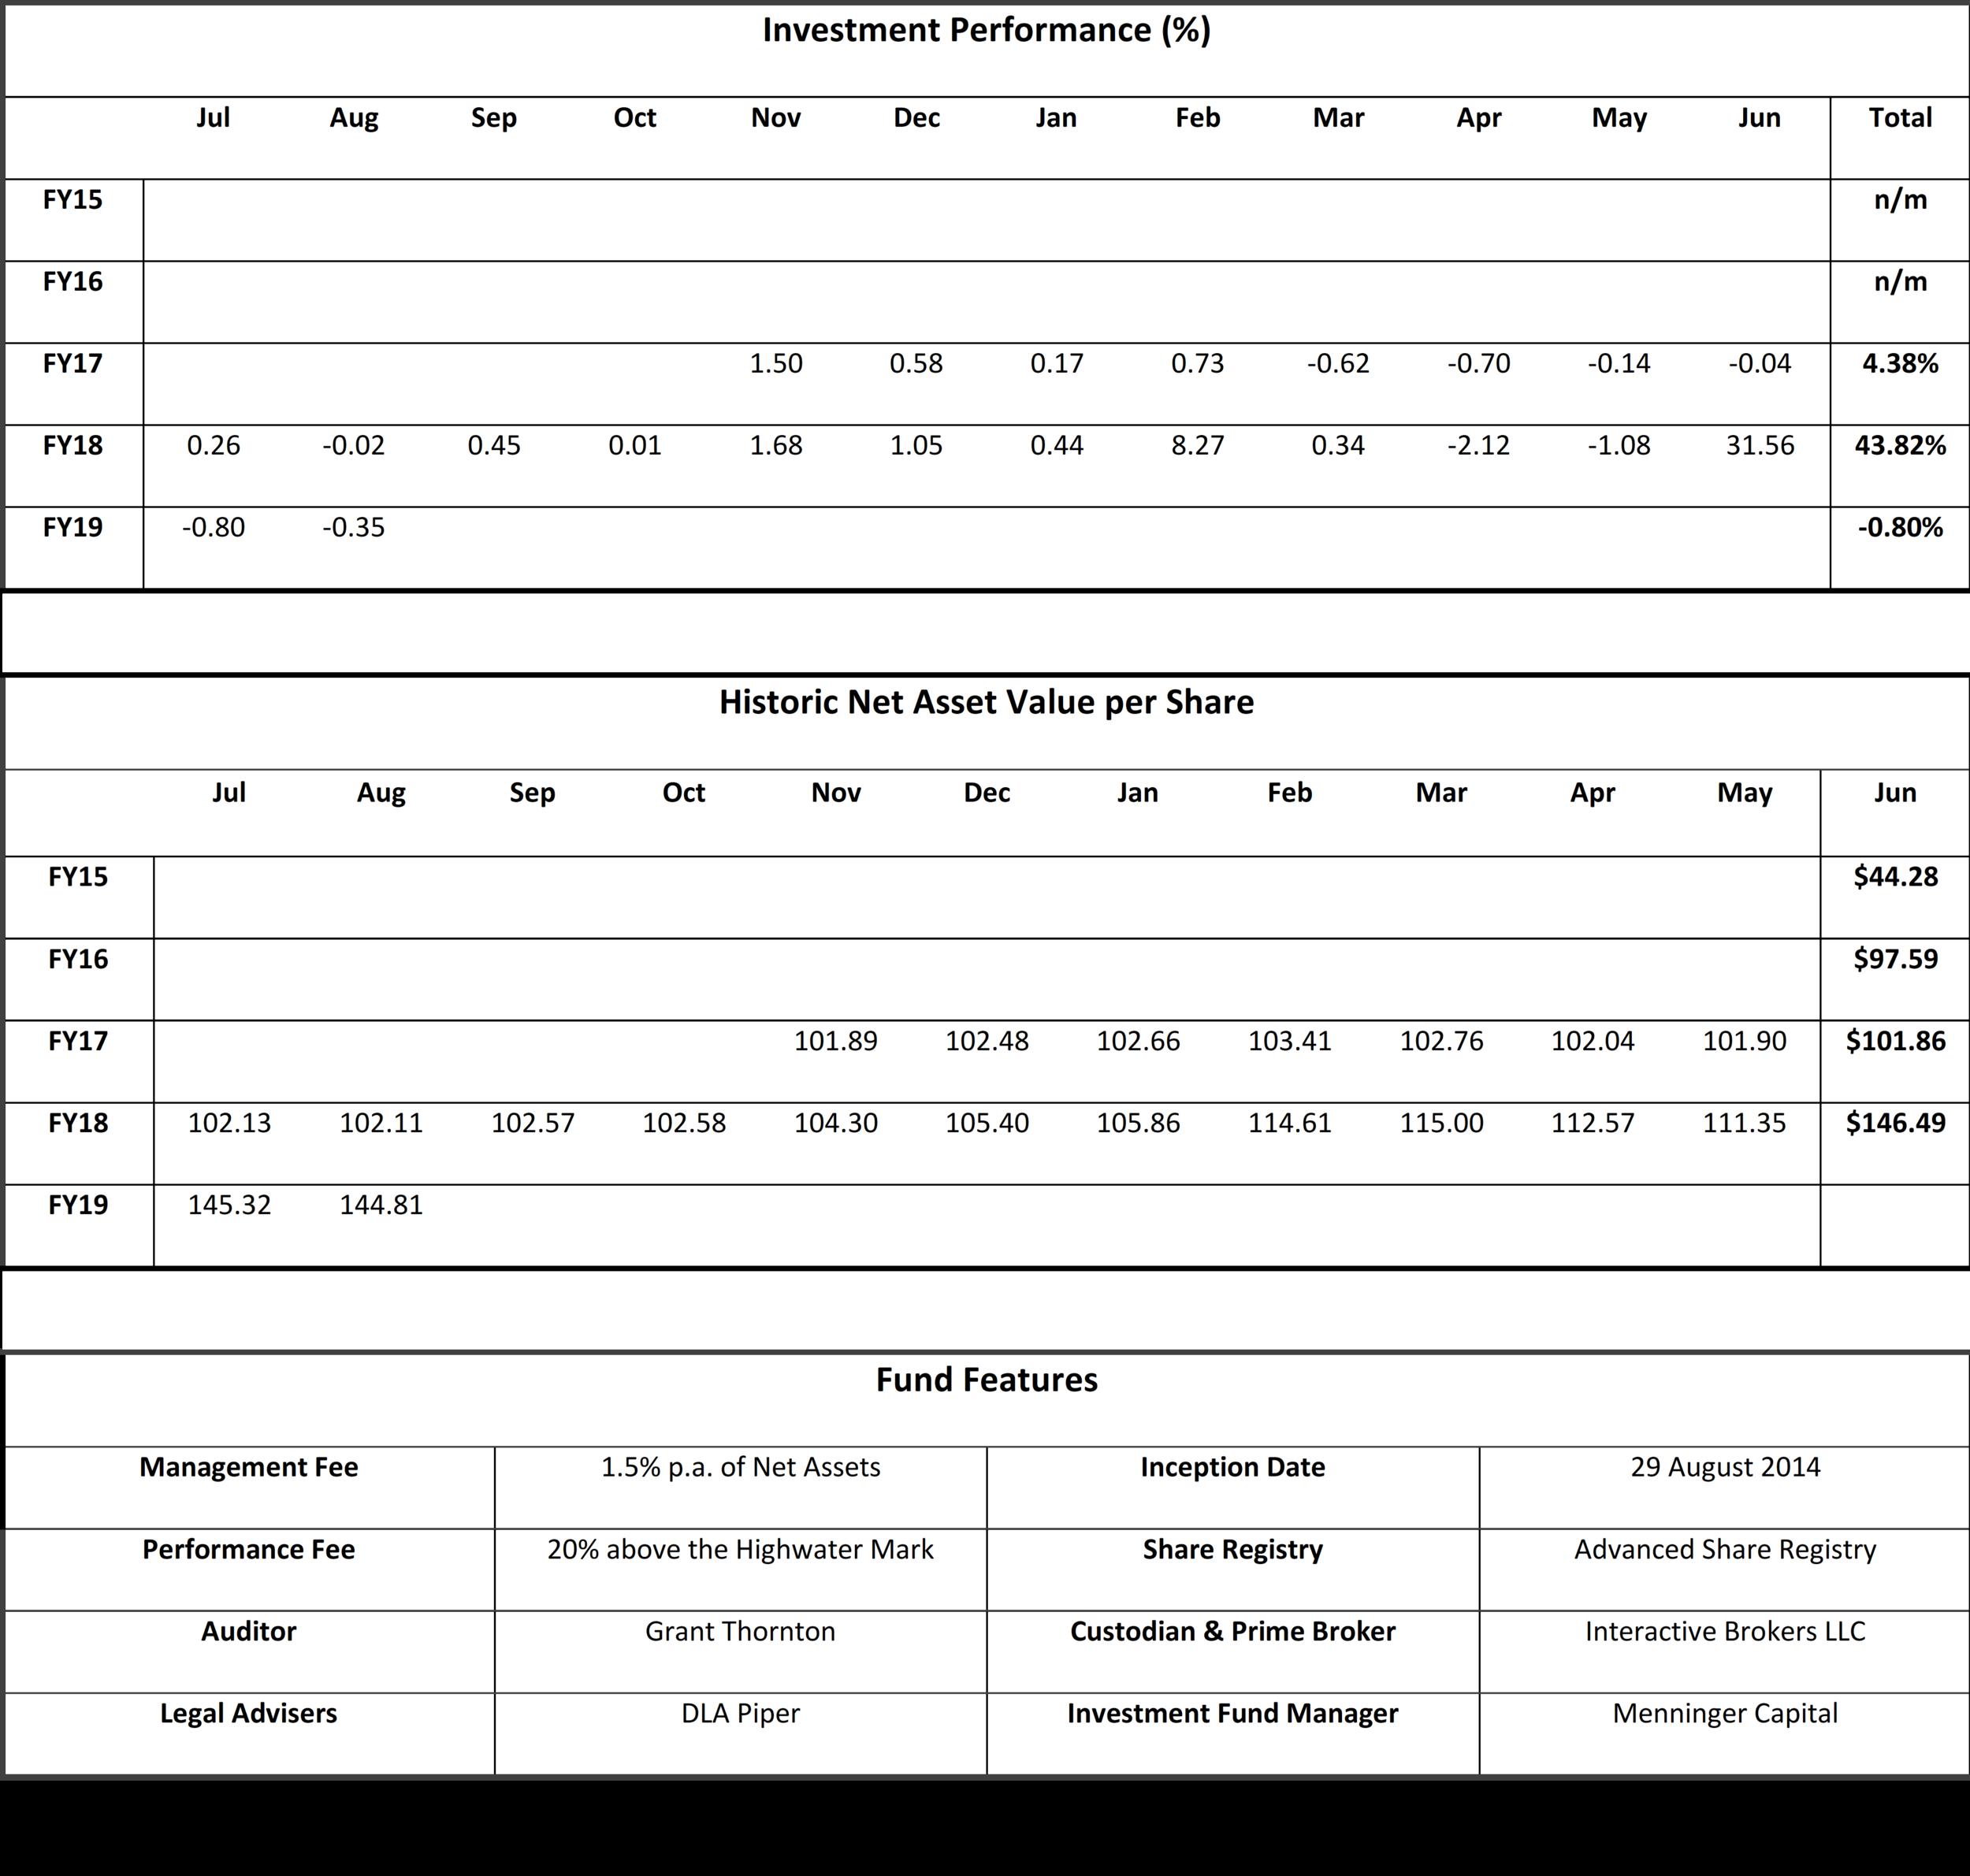 20180831 - Marathon Performance table Aug 2018.png